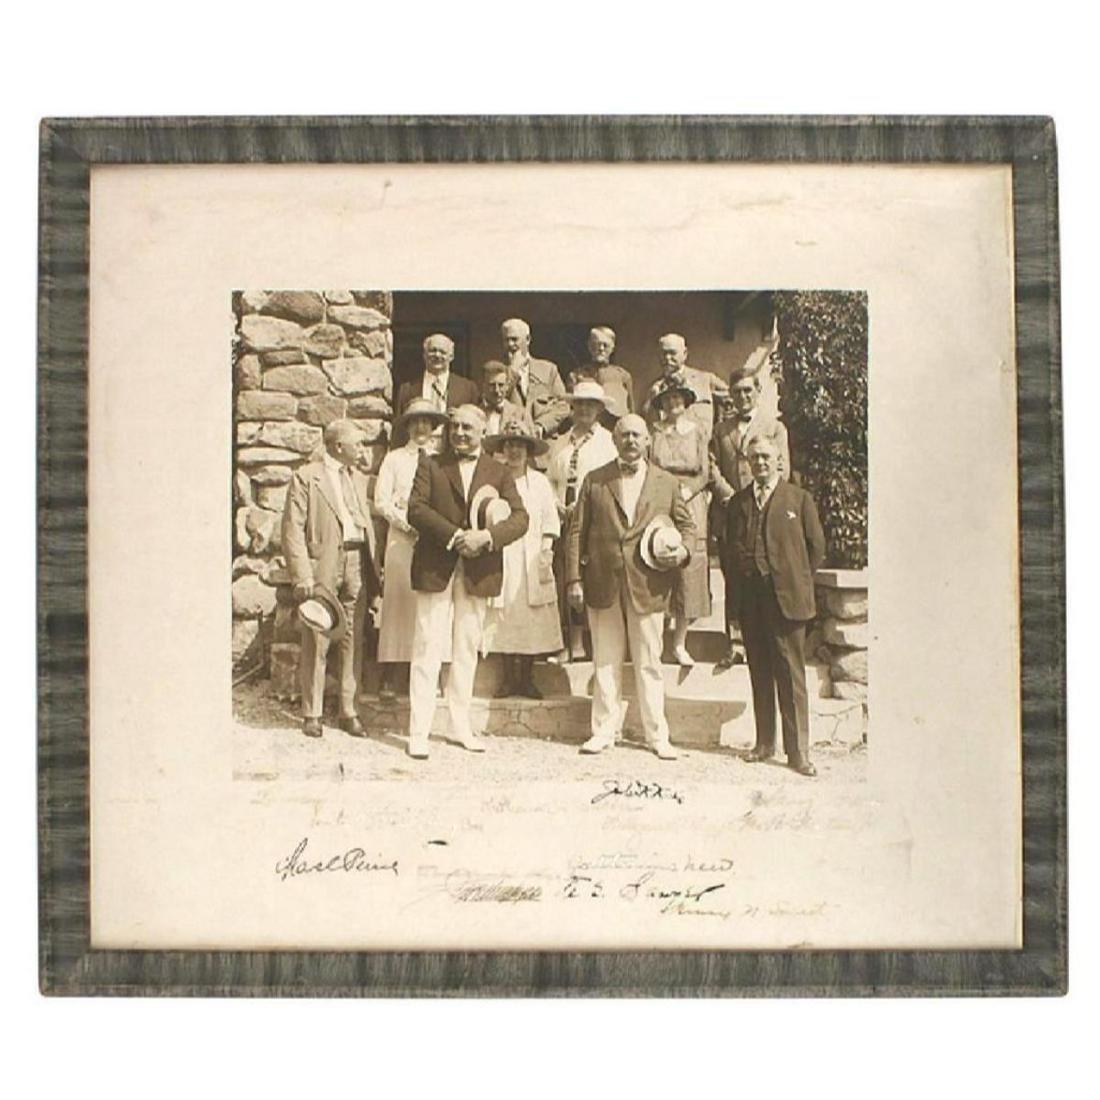 Signed Photo of President Warren G. Harding & Senators